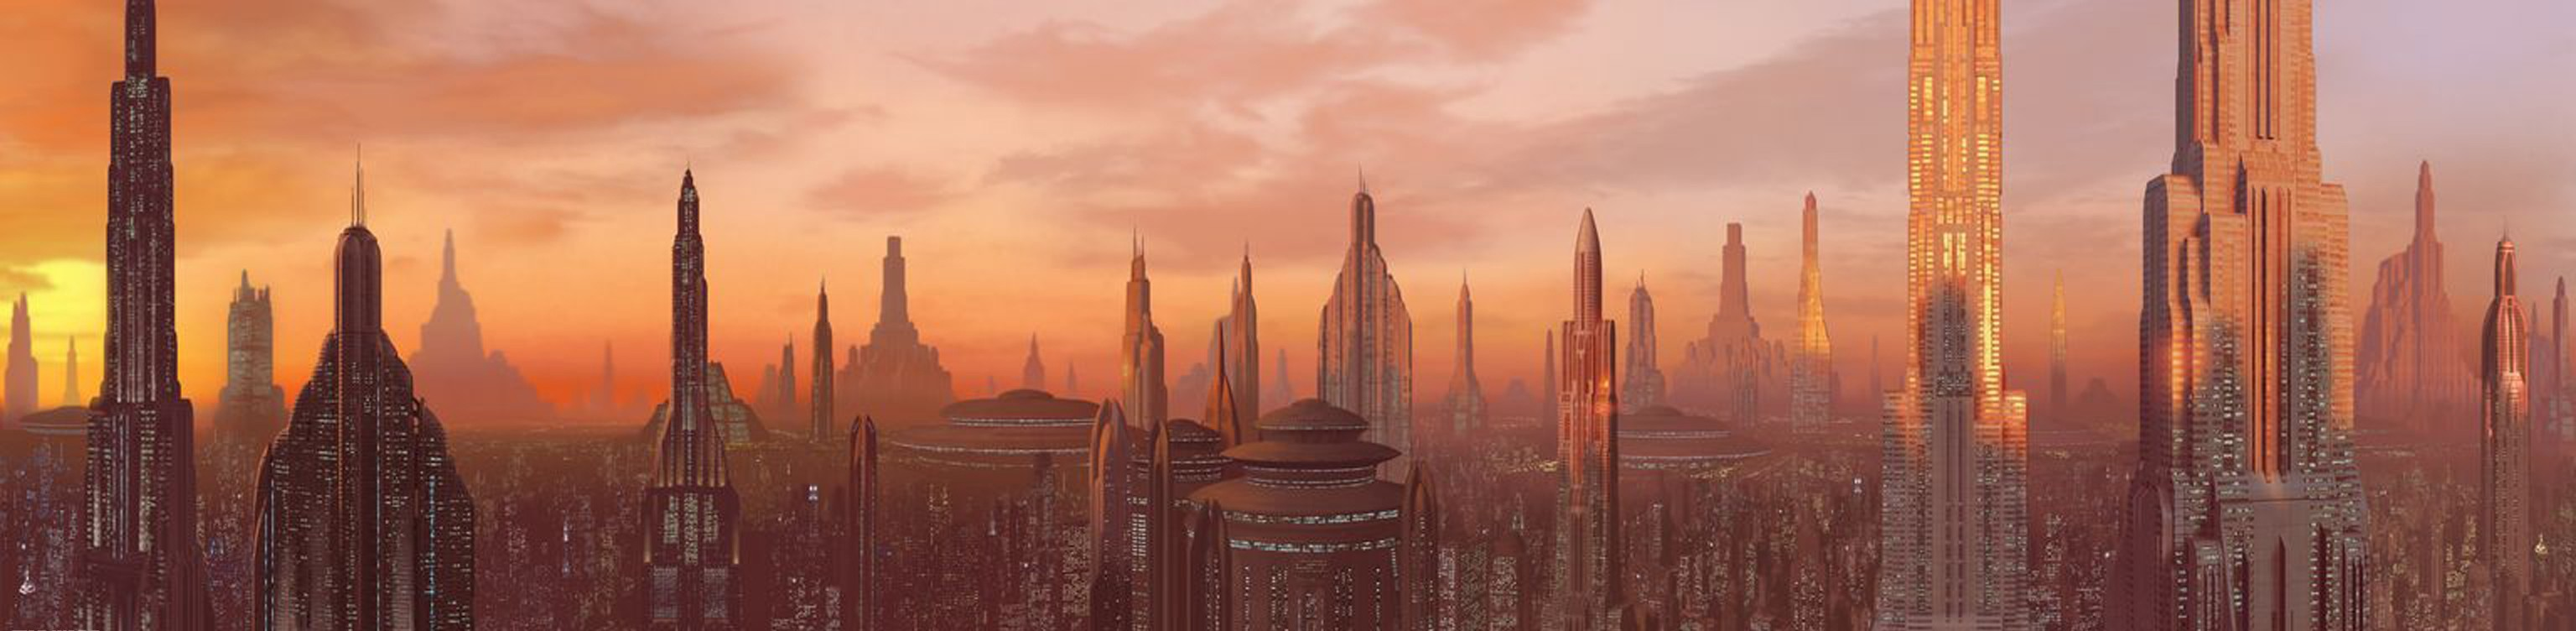 Coruscant Coruscant_skyline